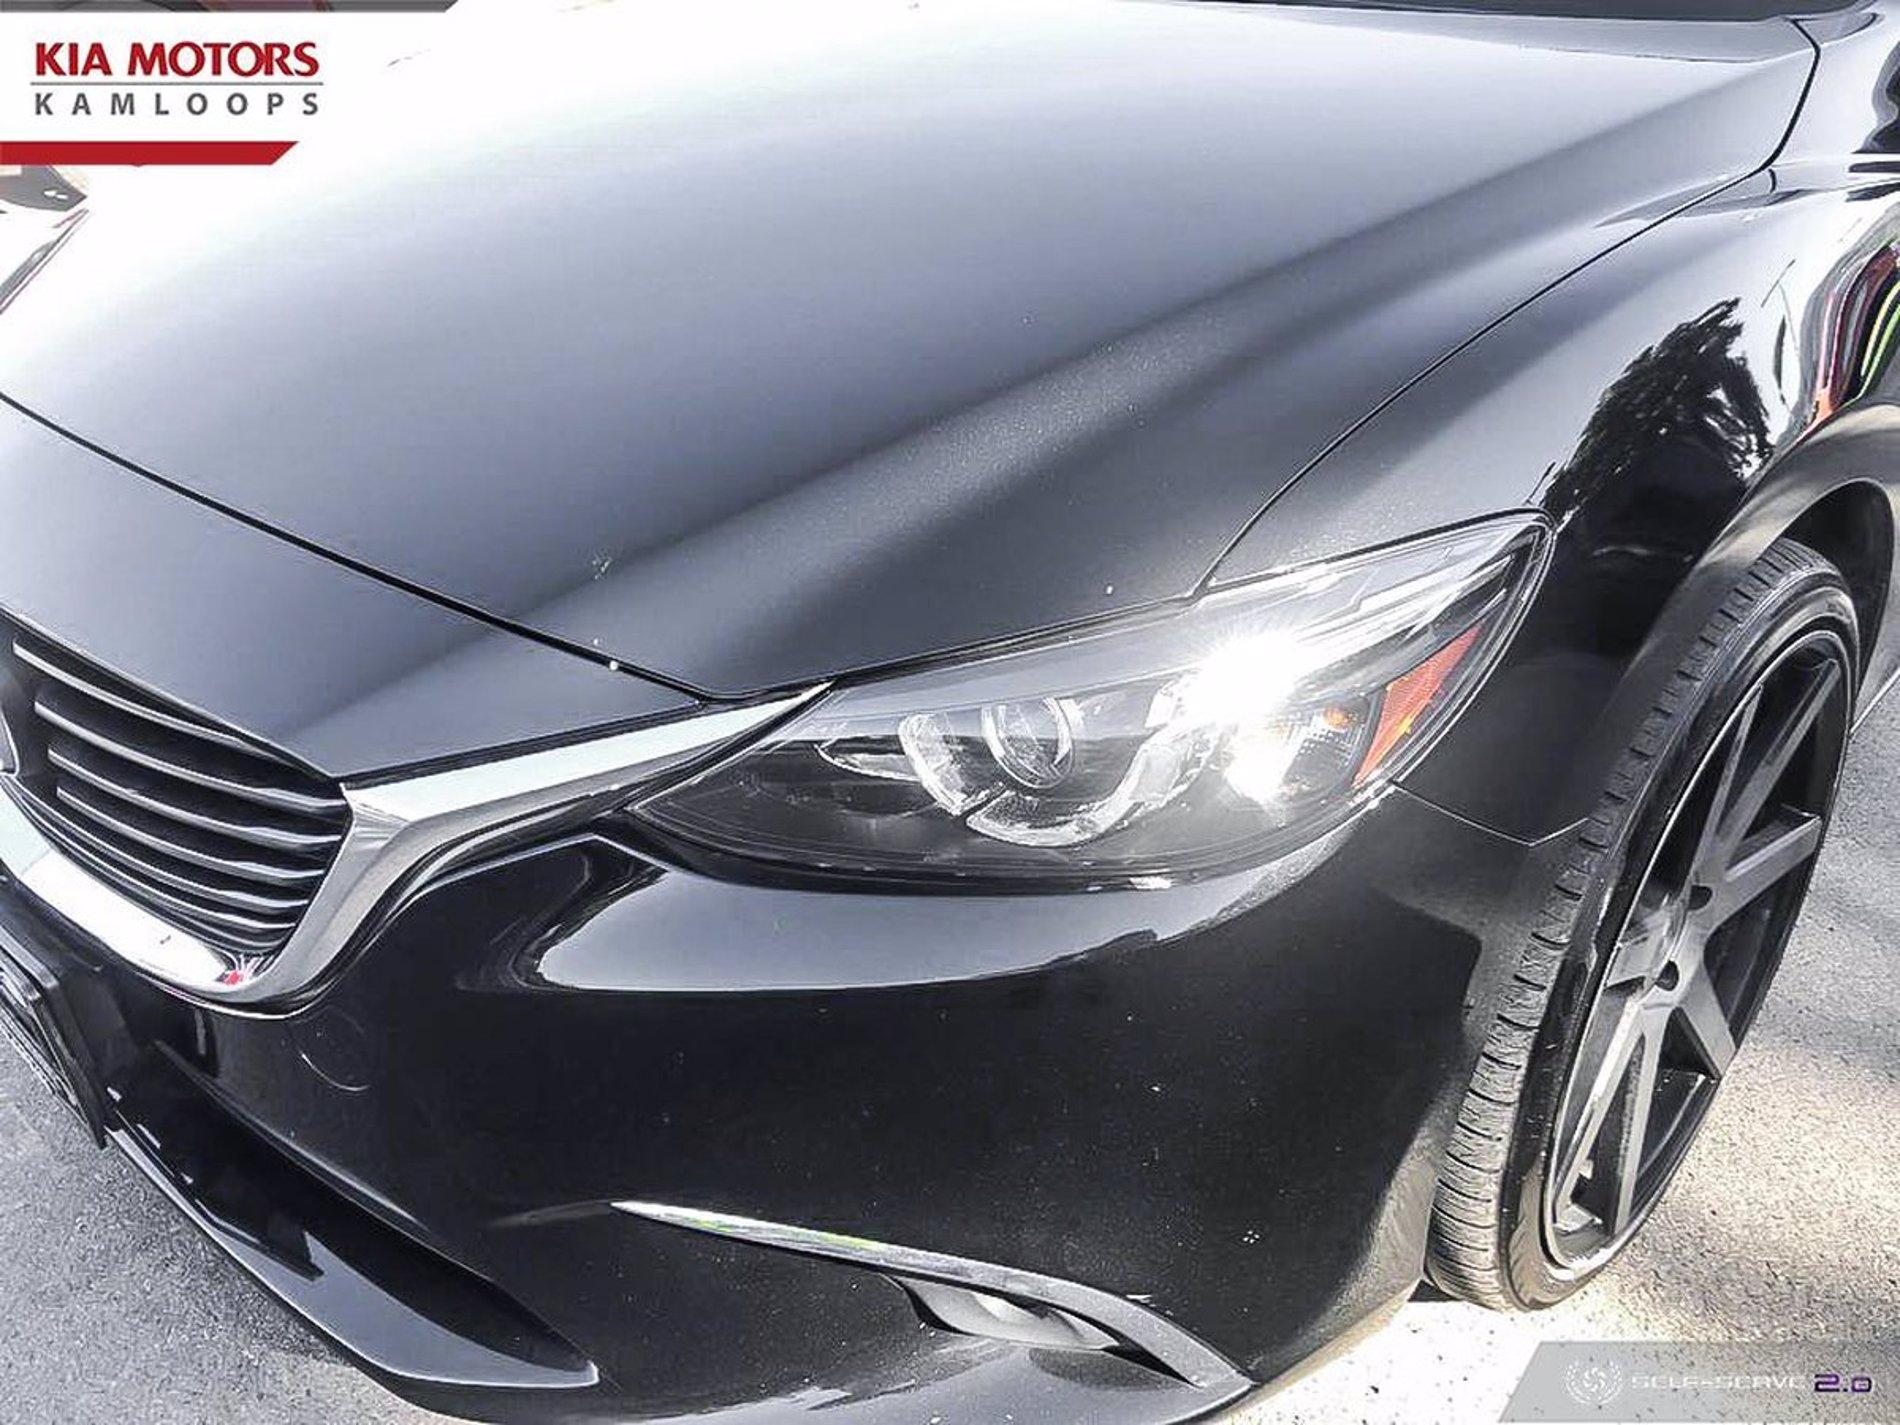 Used 2016 Mazda Mazda6 i Grand Touring 4dr Sdn Auto i Grand Touring at AutoNow - Your FRIENDLY Auto Credit Solution